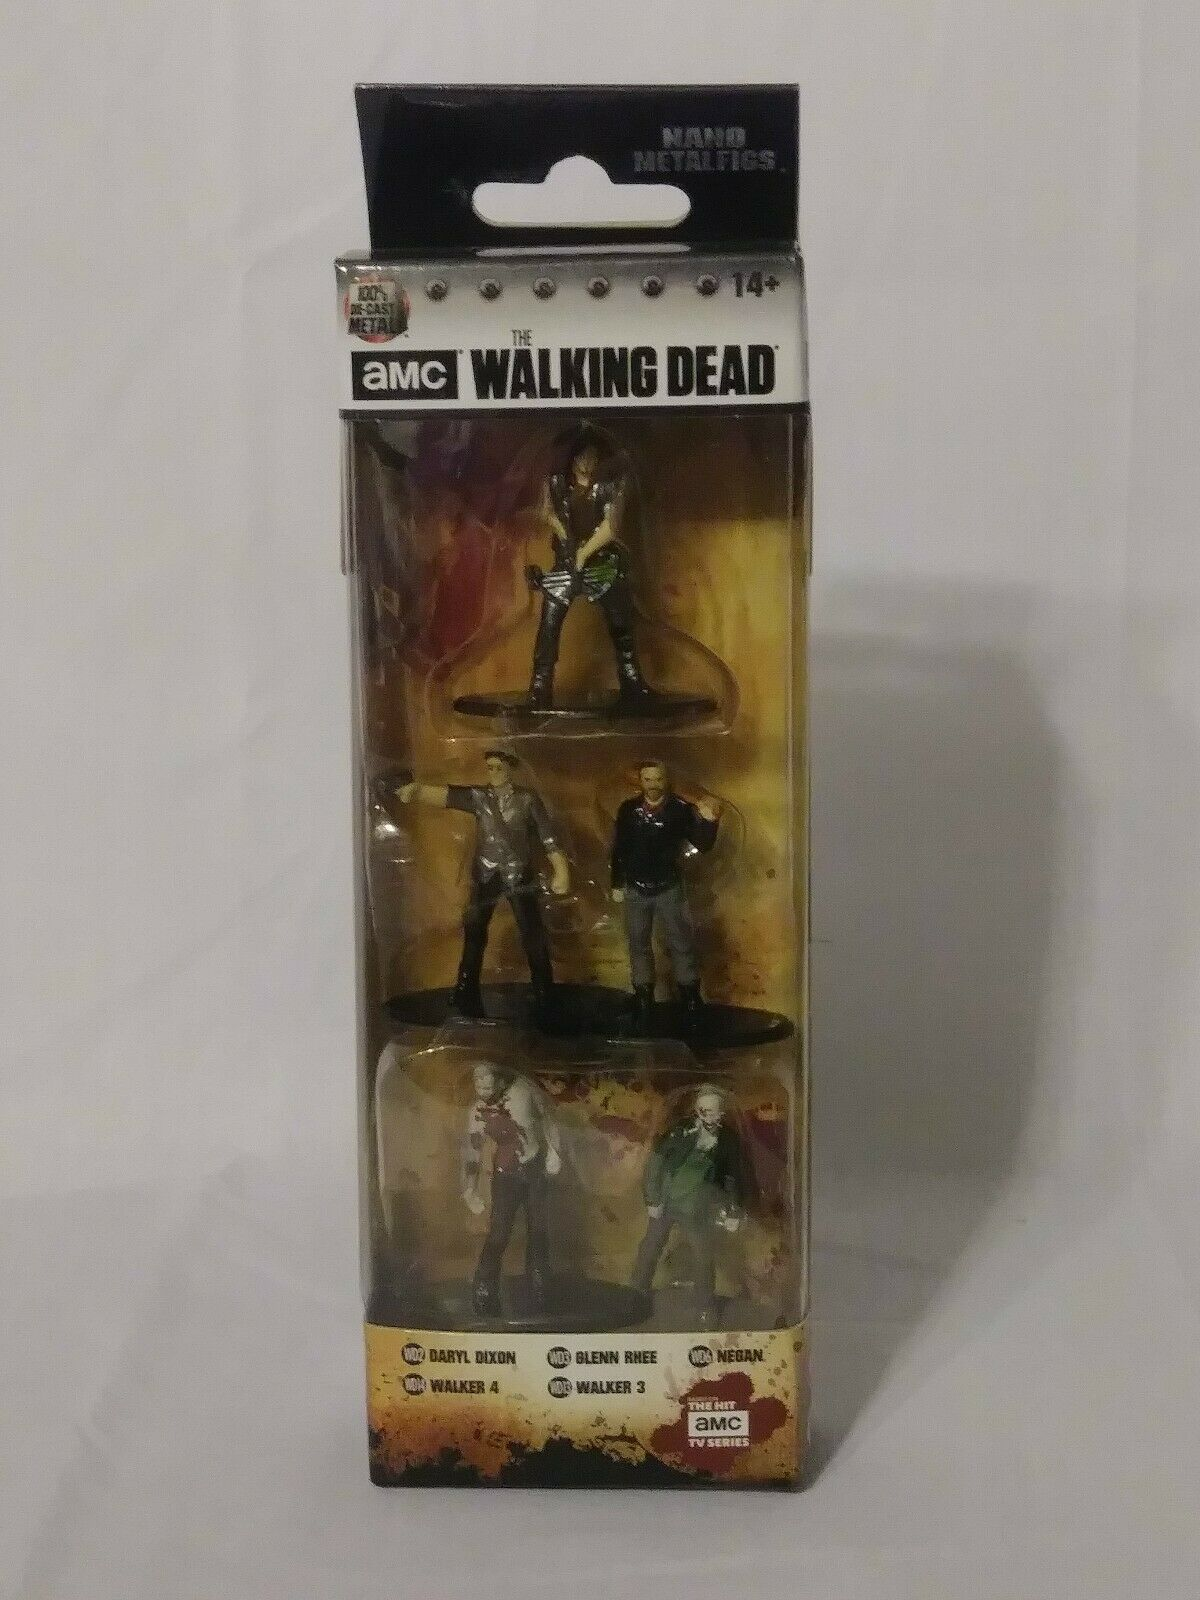 NEW The Walking Dead Nano Metal Figs Daryl Dixon, Glenn Rhee, Negan, Walker 3&4